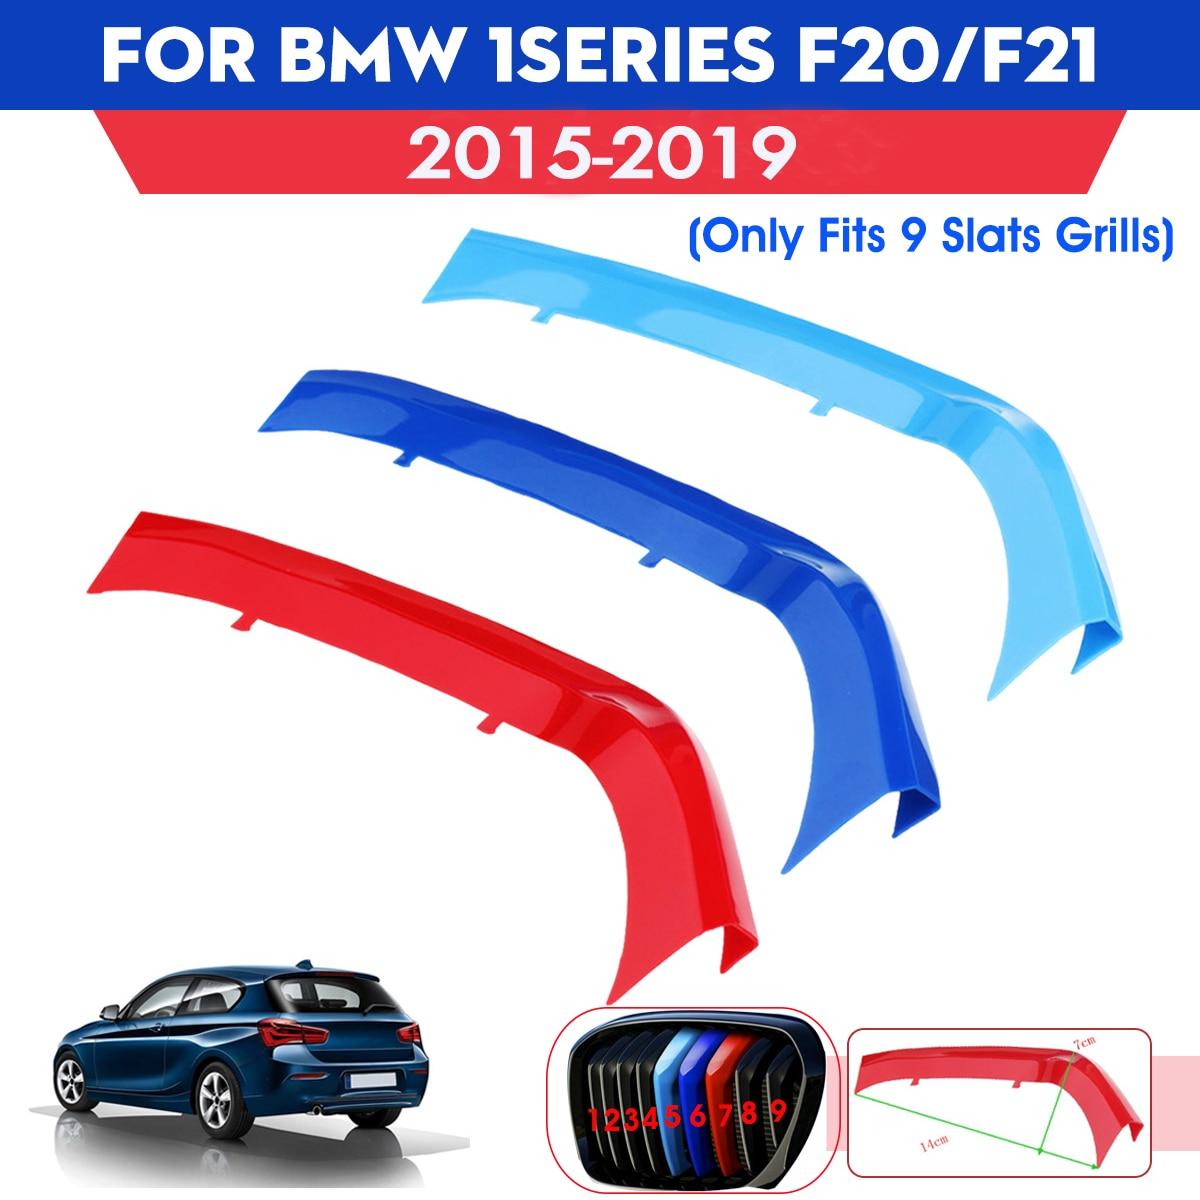 1x M LOOK Gloss Black Kidney Grille TWIN SLAT for BMW F20 F21 1 Series LCI 15-17